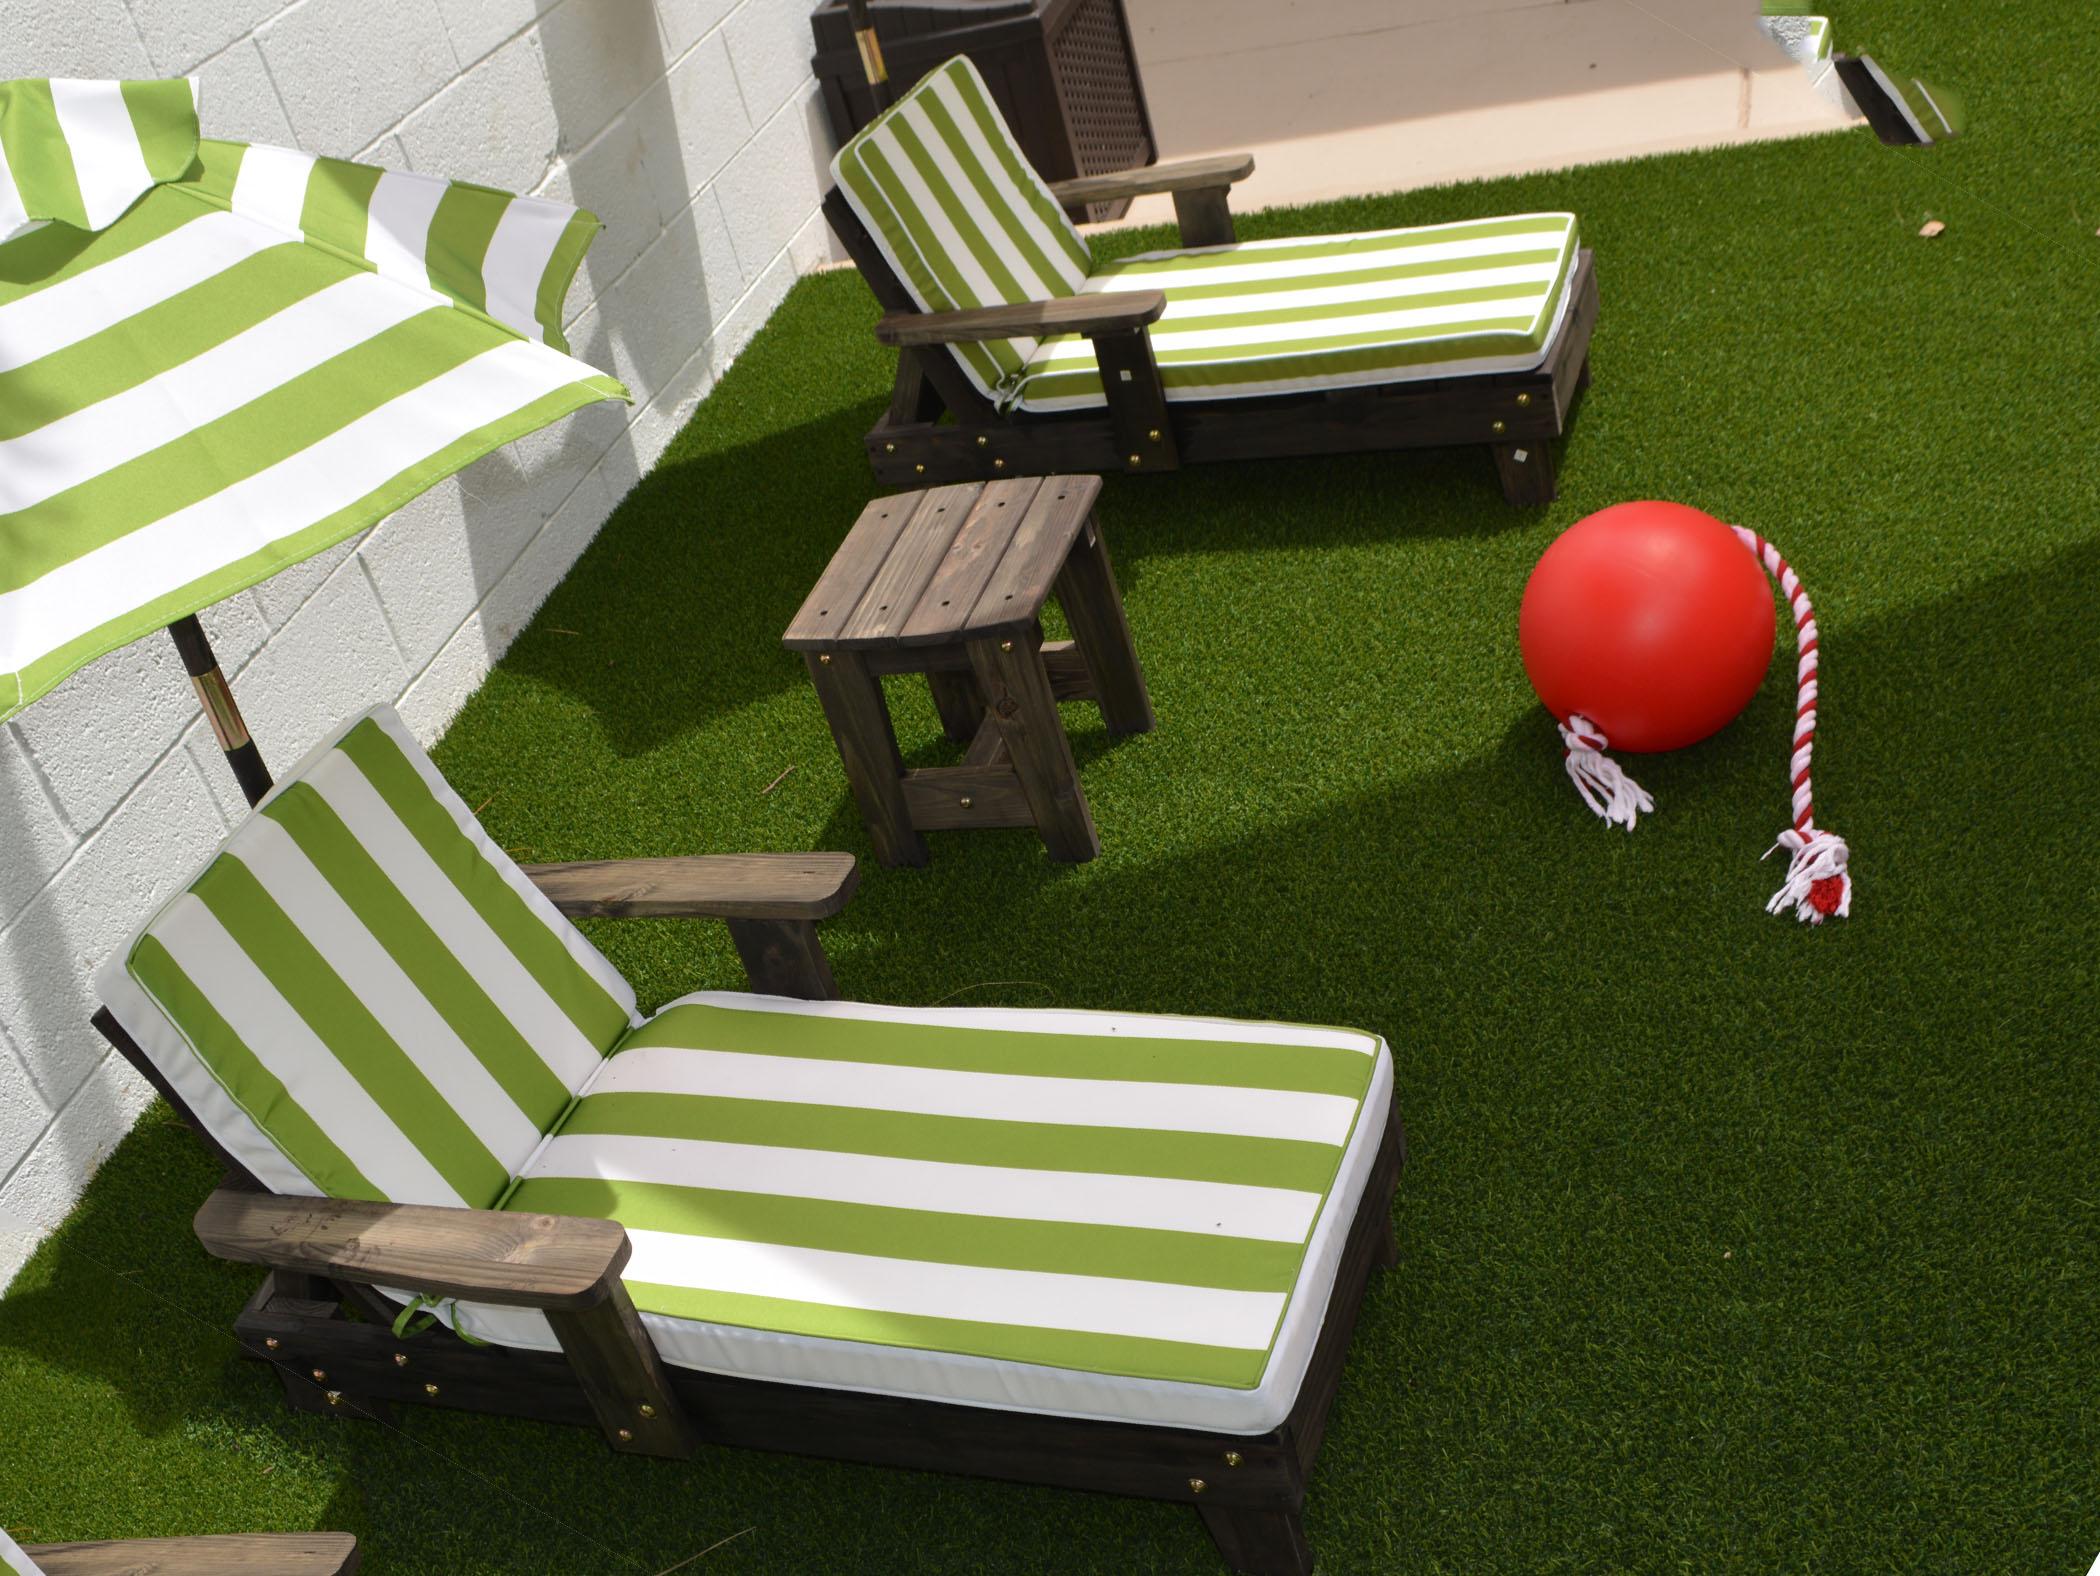 Backyard Designs with Synthetic Turf Sherman Oaks, California